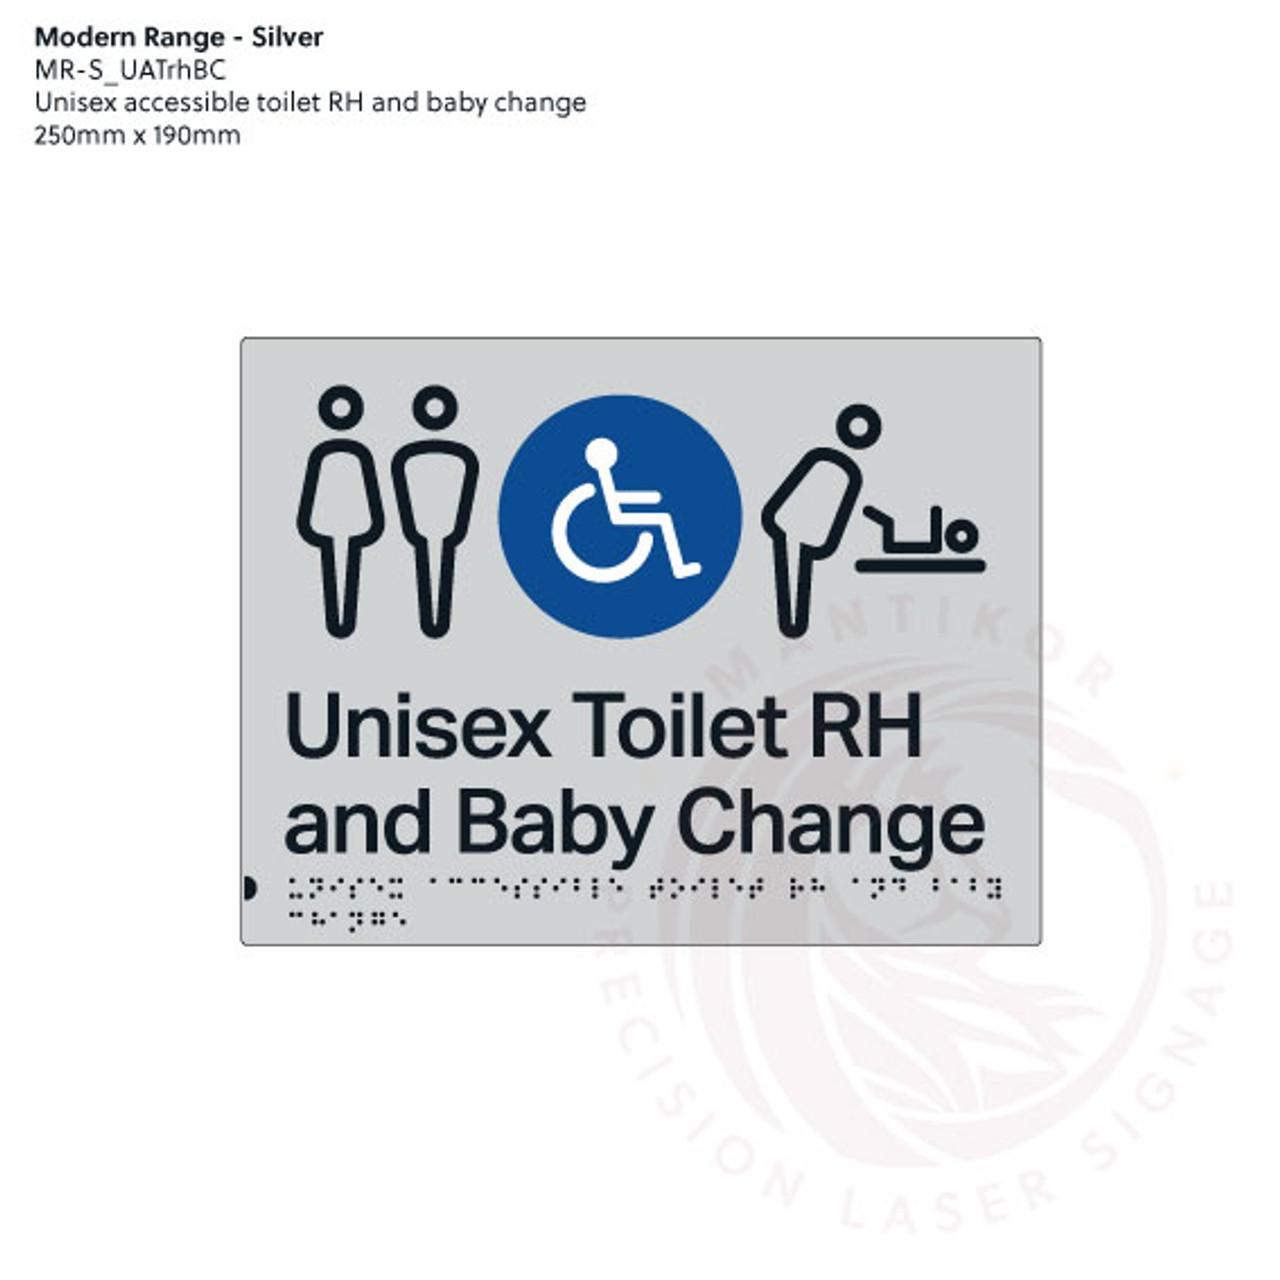 Unisex accessible Toilet RH and Baby Change (MR-S_UATrhBC)